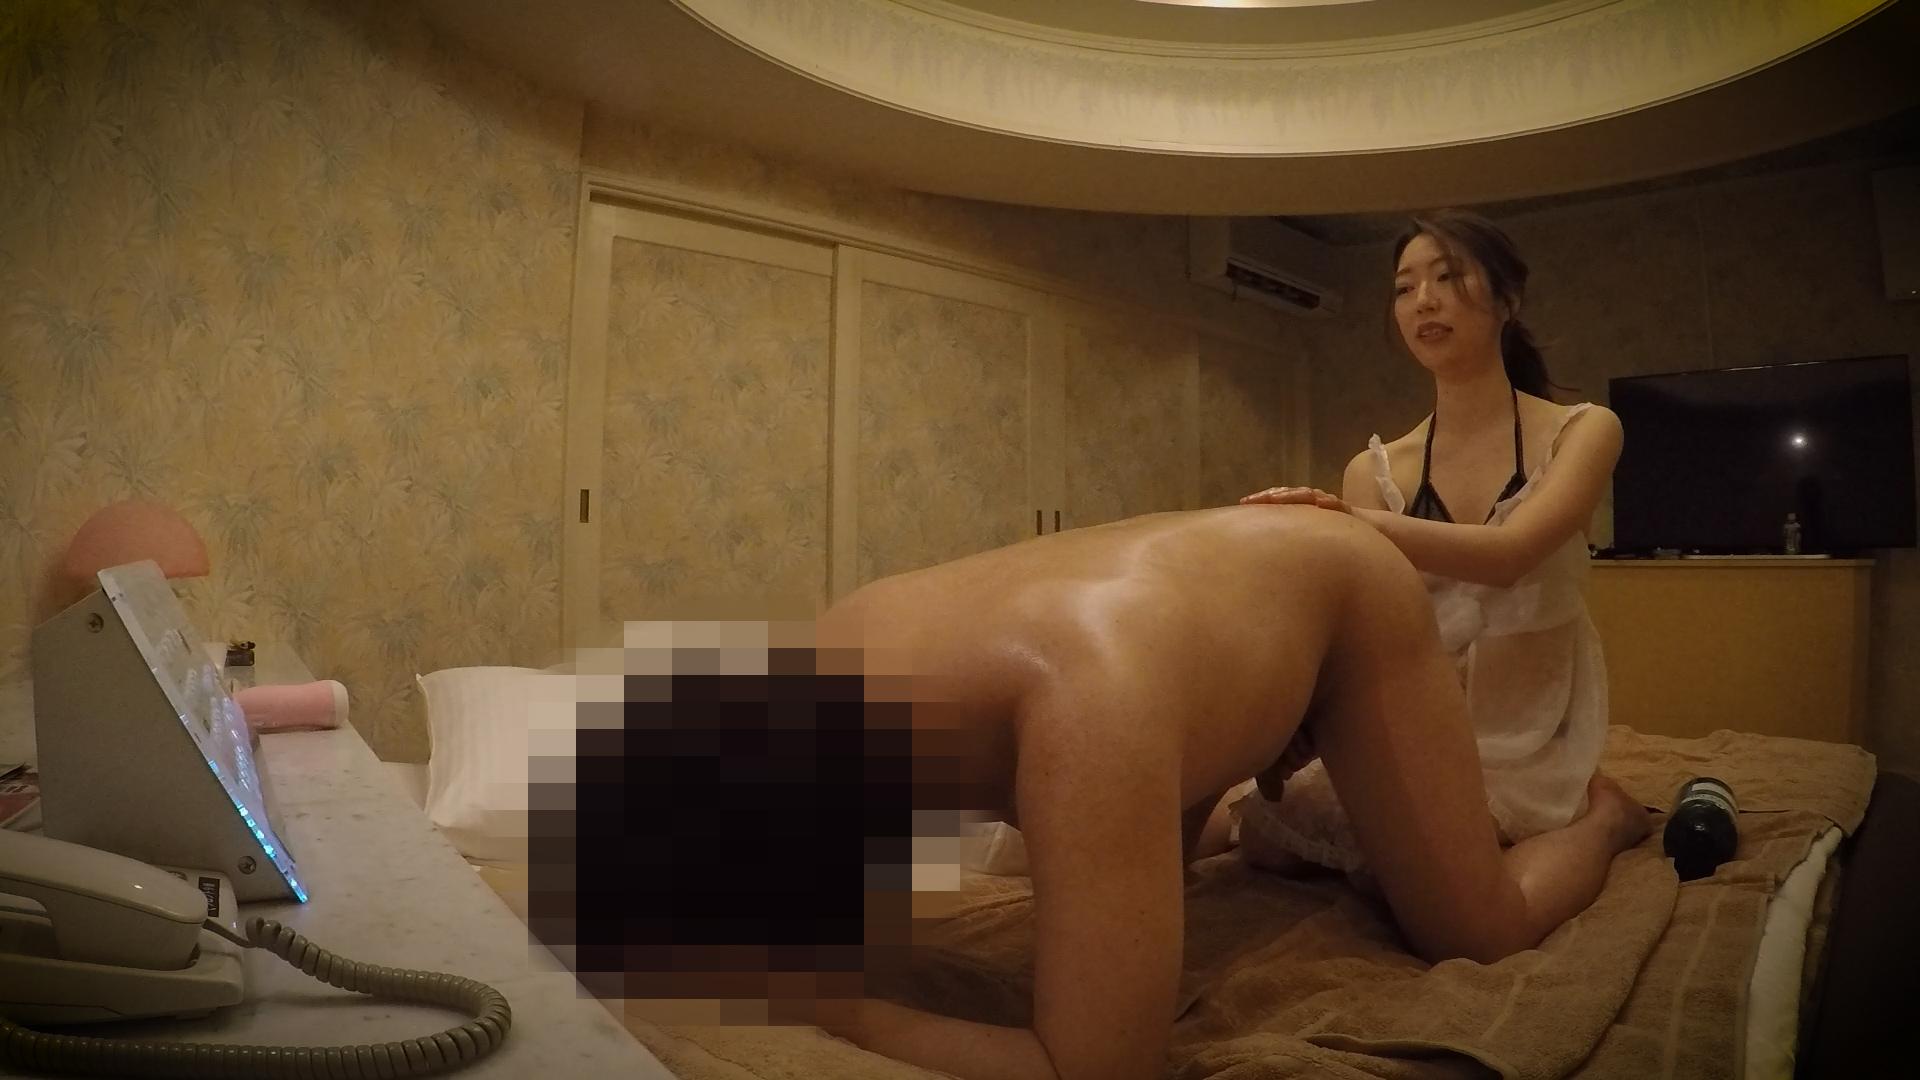 FC2 PPV 1383974 【流出】援の個人撮影[No.37]22歳 美人メンエス嬢にマッサージしてもらった後、ハメちゃいました【レビュー特典:別アングル】